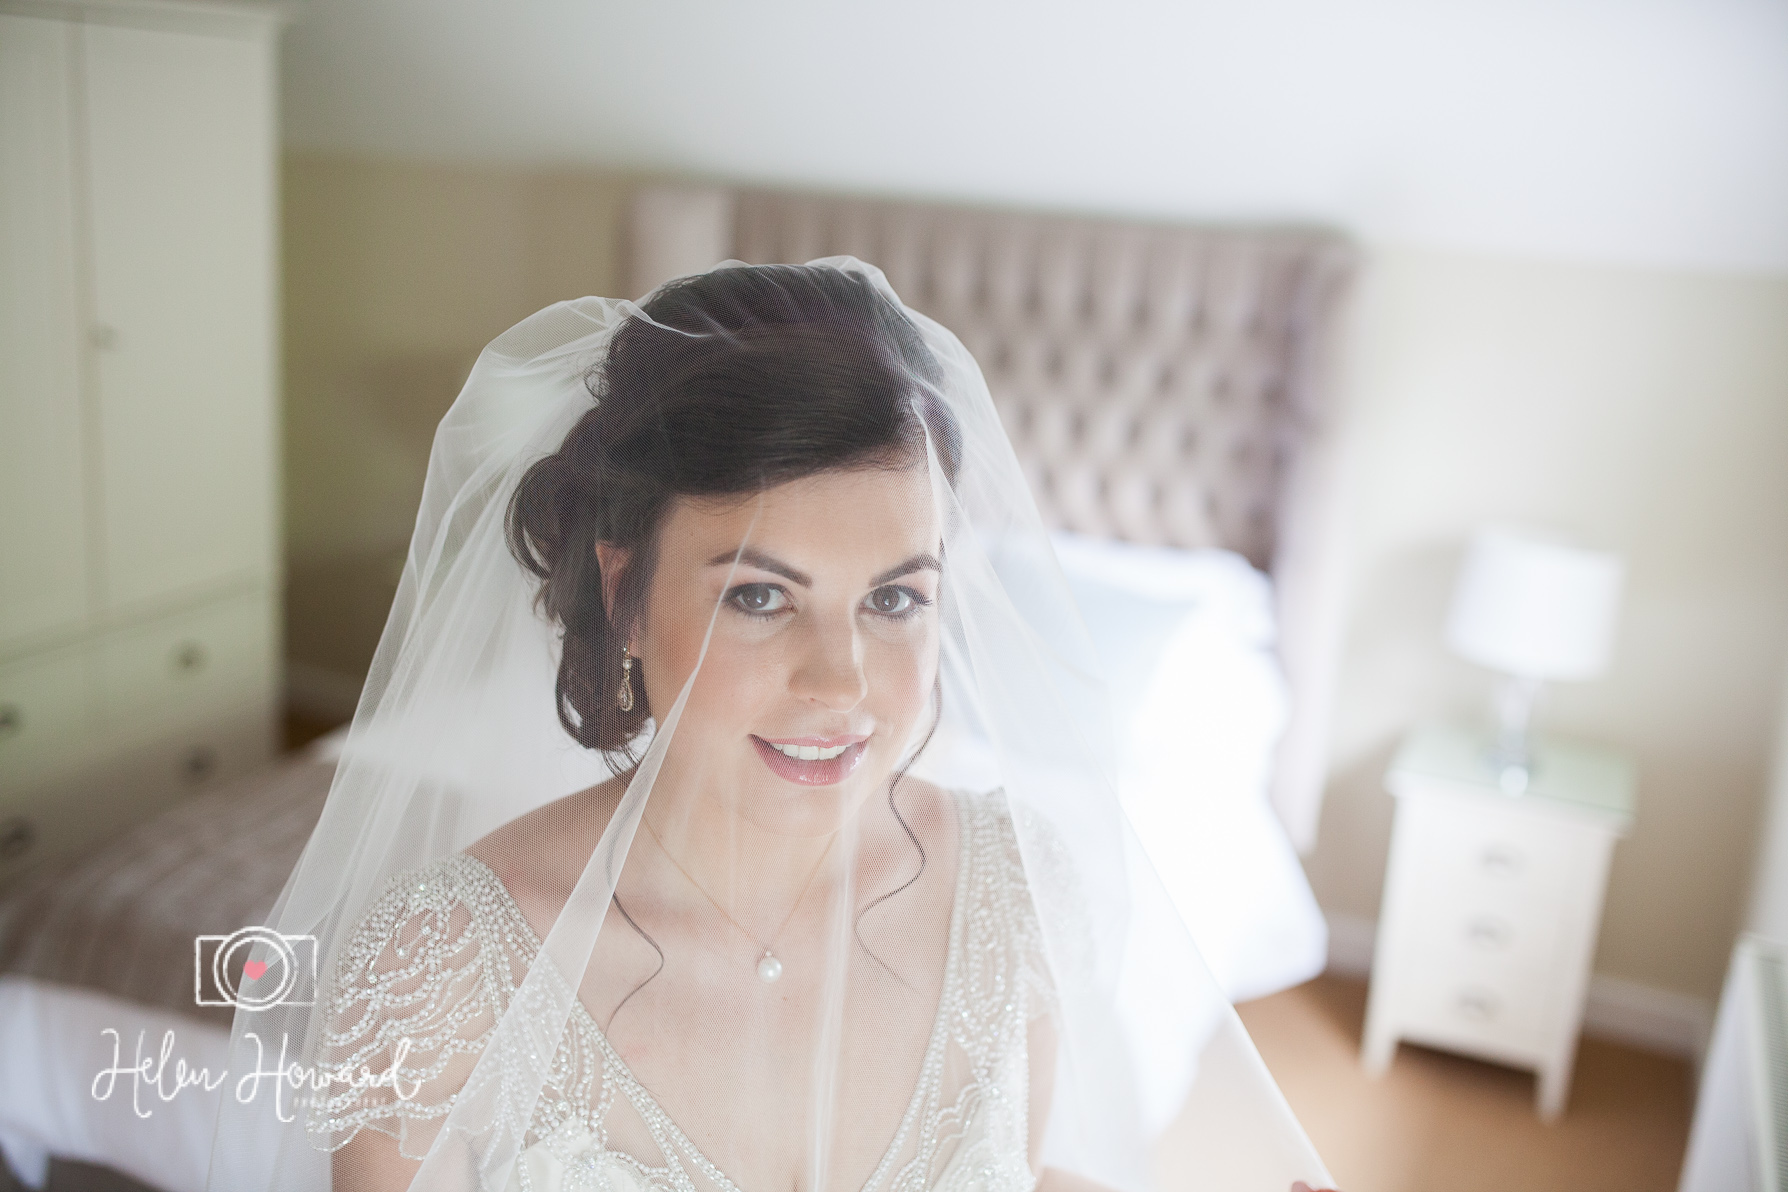 Helen Howard Photography Packington Moor Wedding-46.jpg